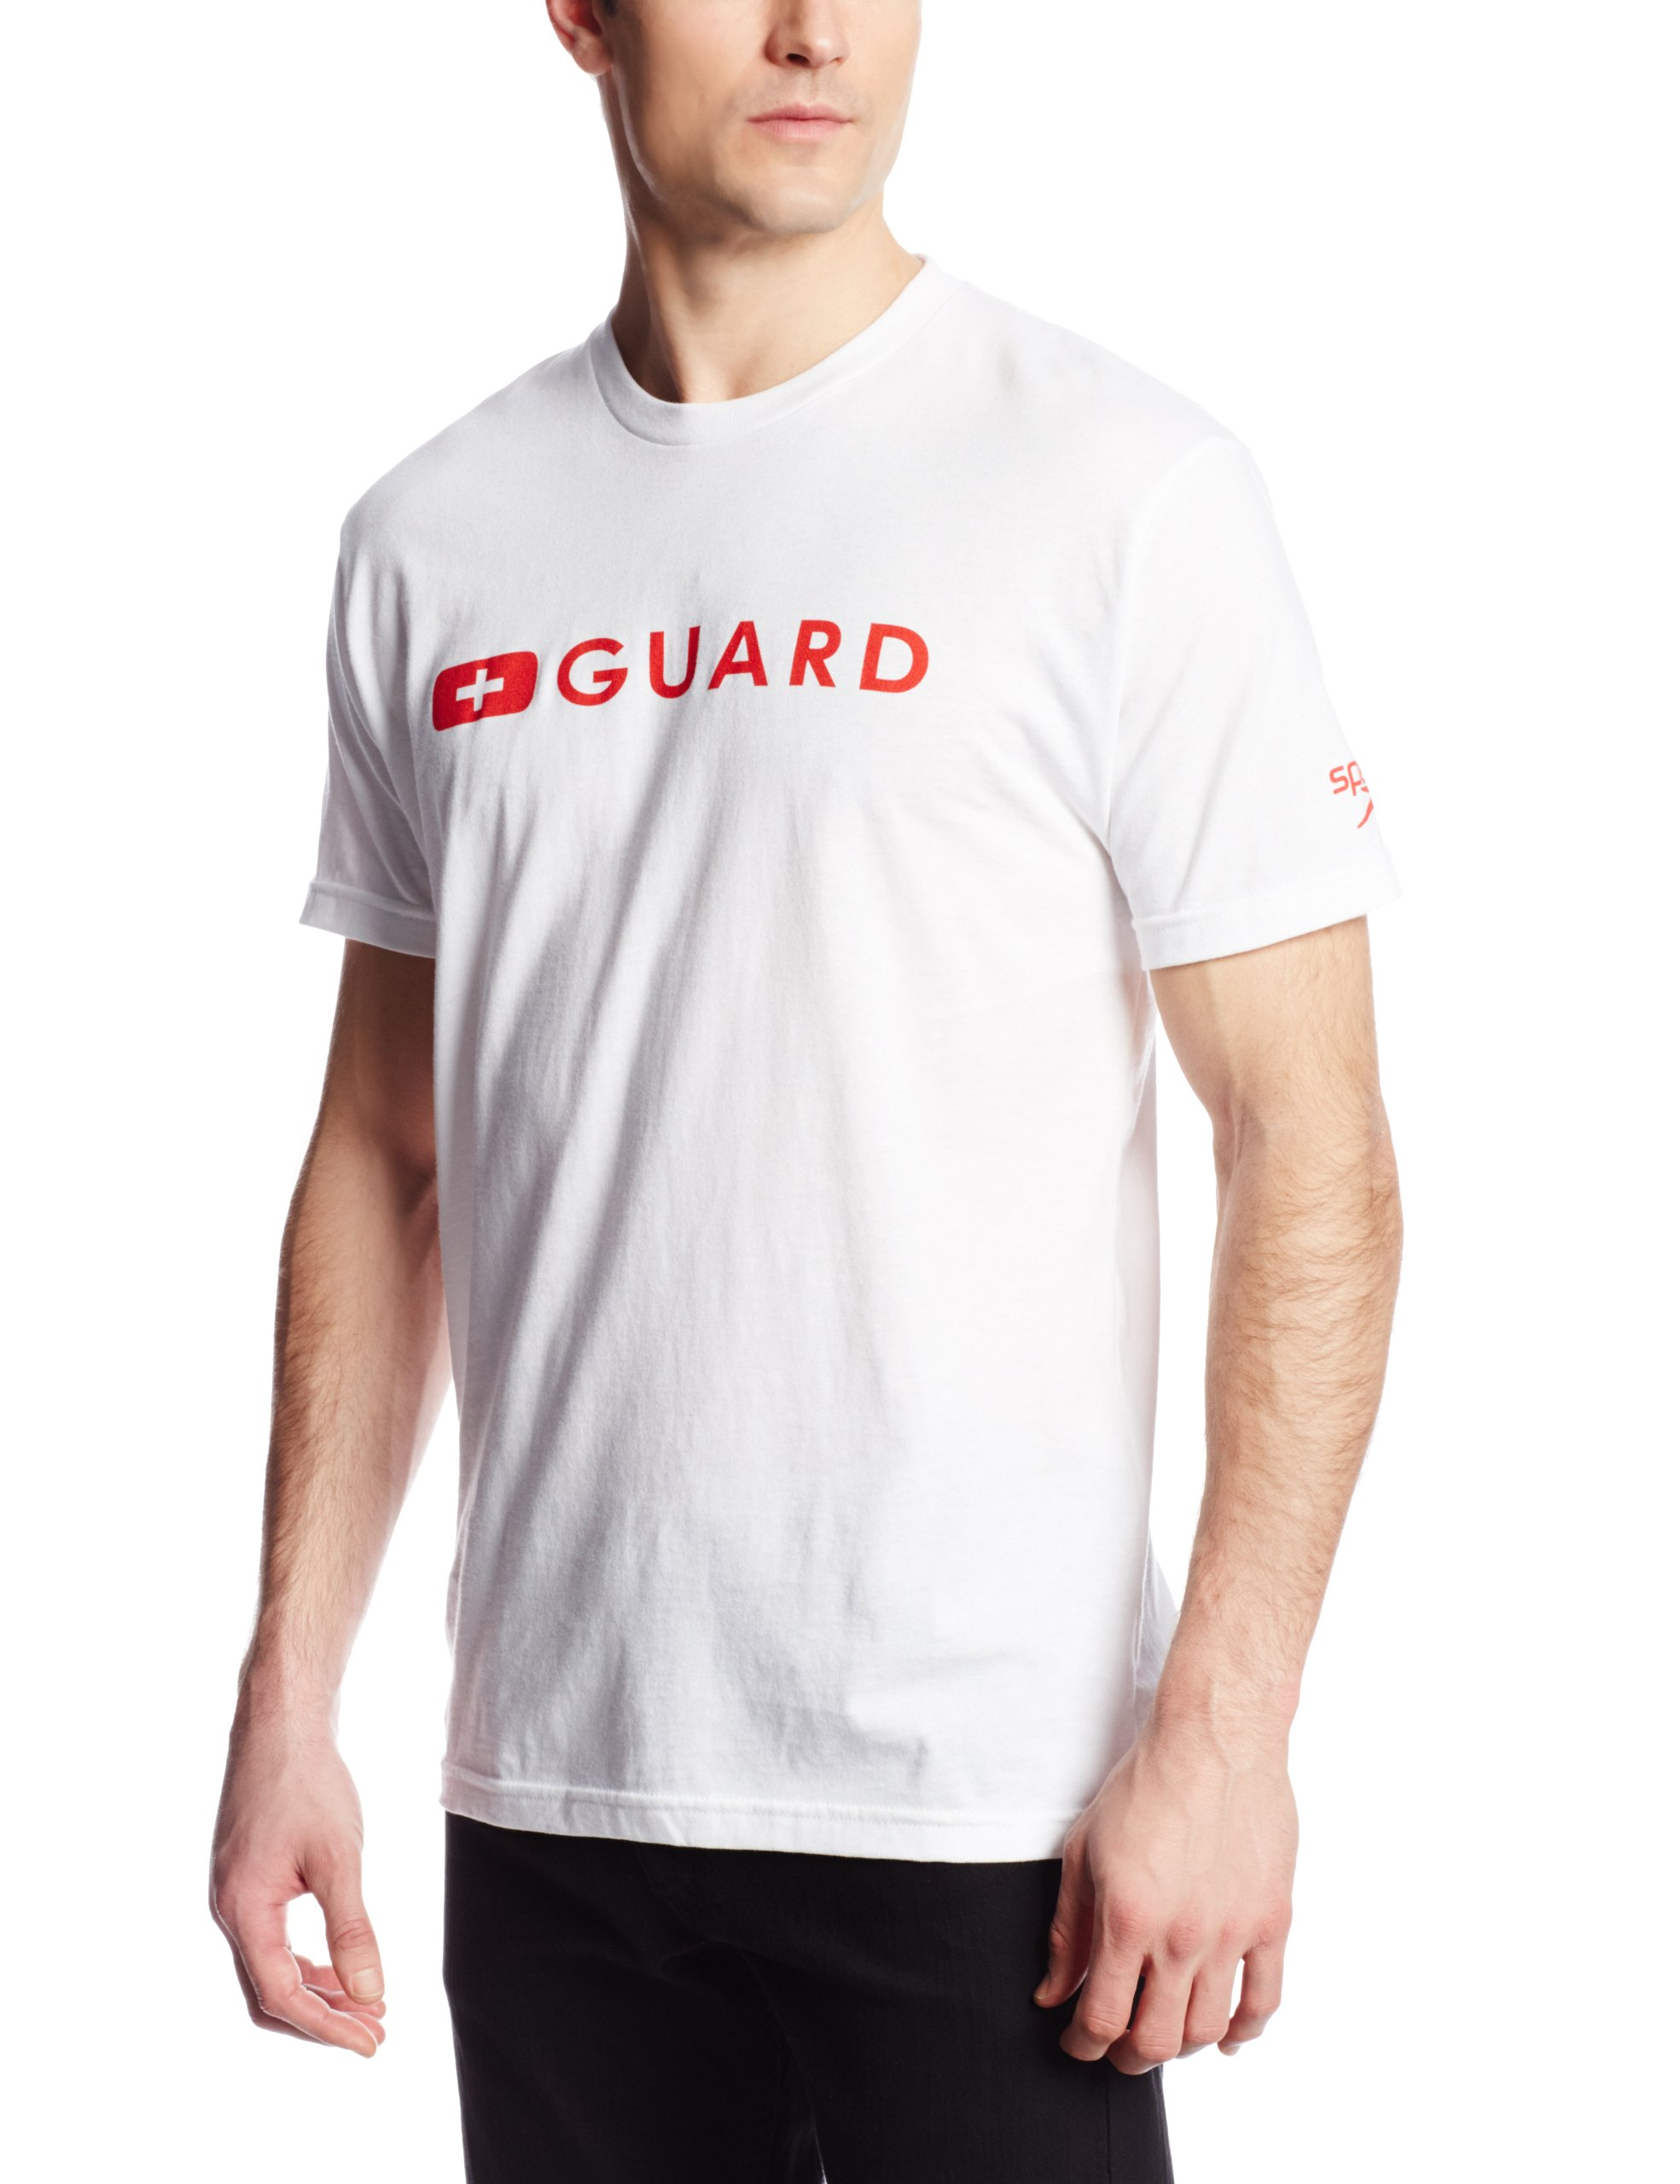 Speedo Men's Guard Short Sleeve Tee Shirt, White, X-Large